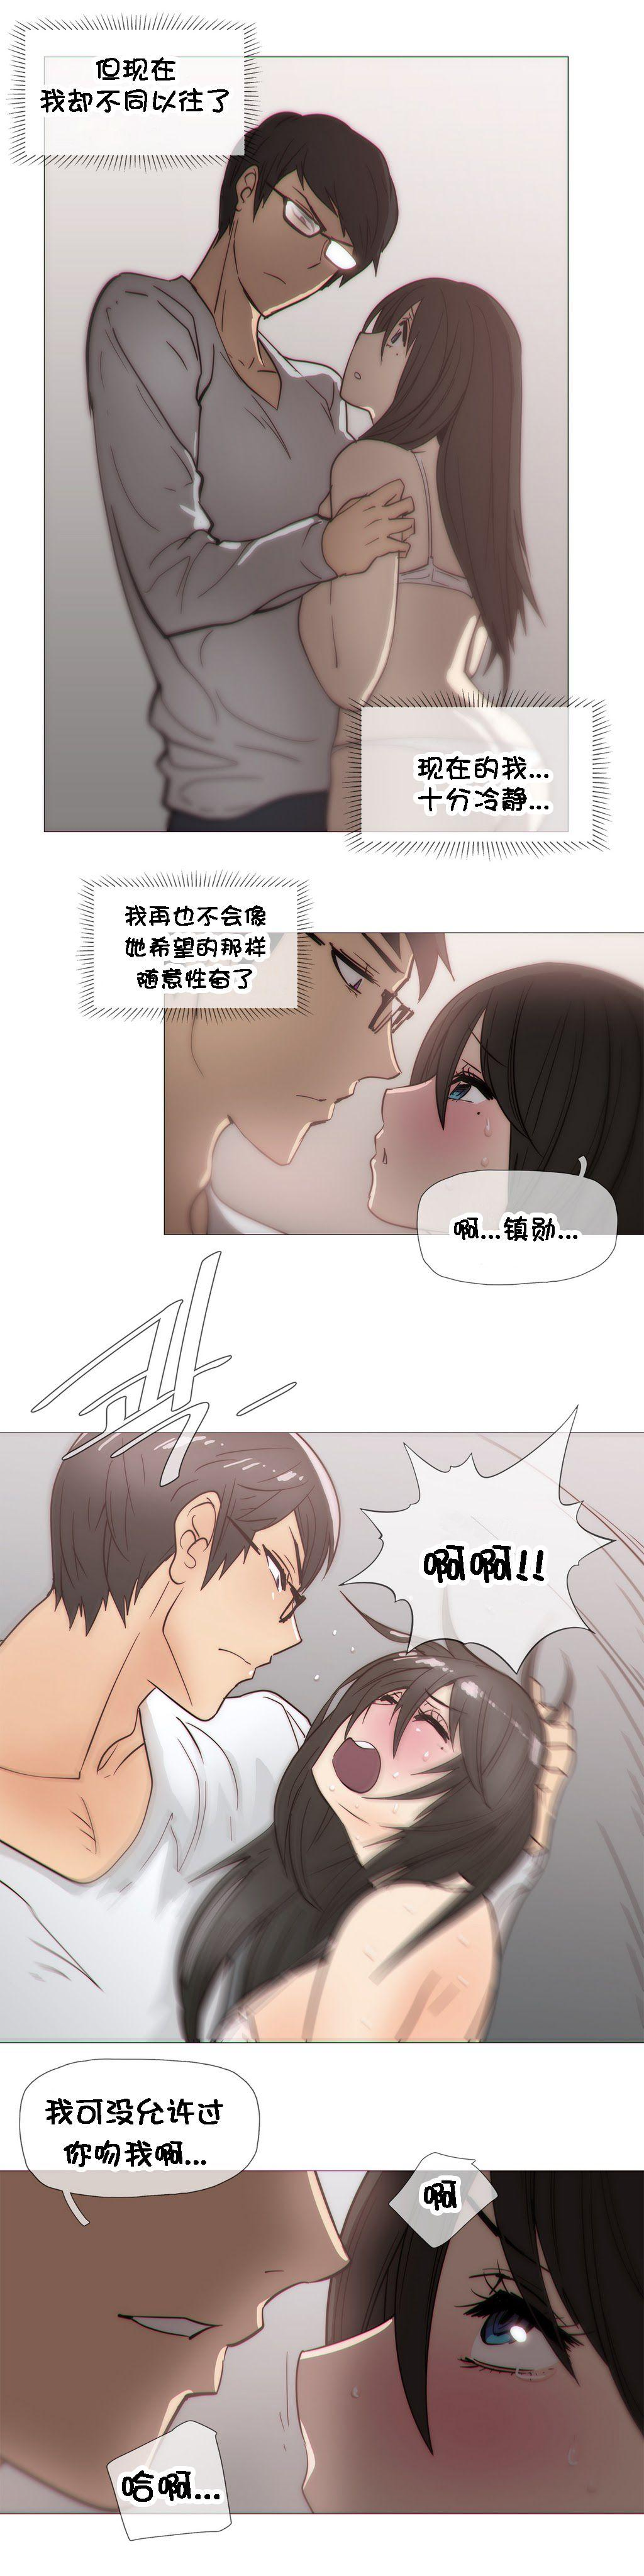 HouseHold Affairs 【卞赤鲤个人汉化】1~33话(持续更新中) 611